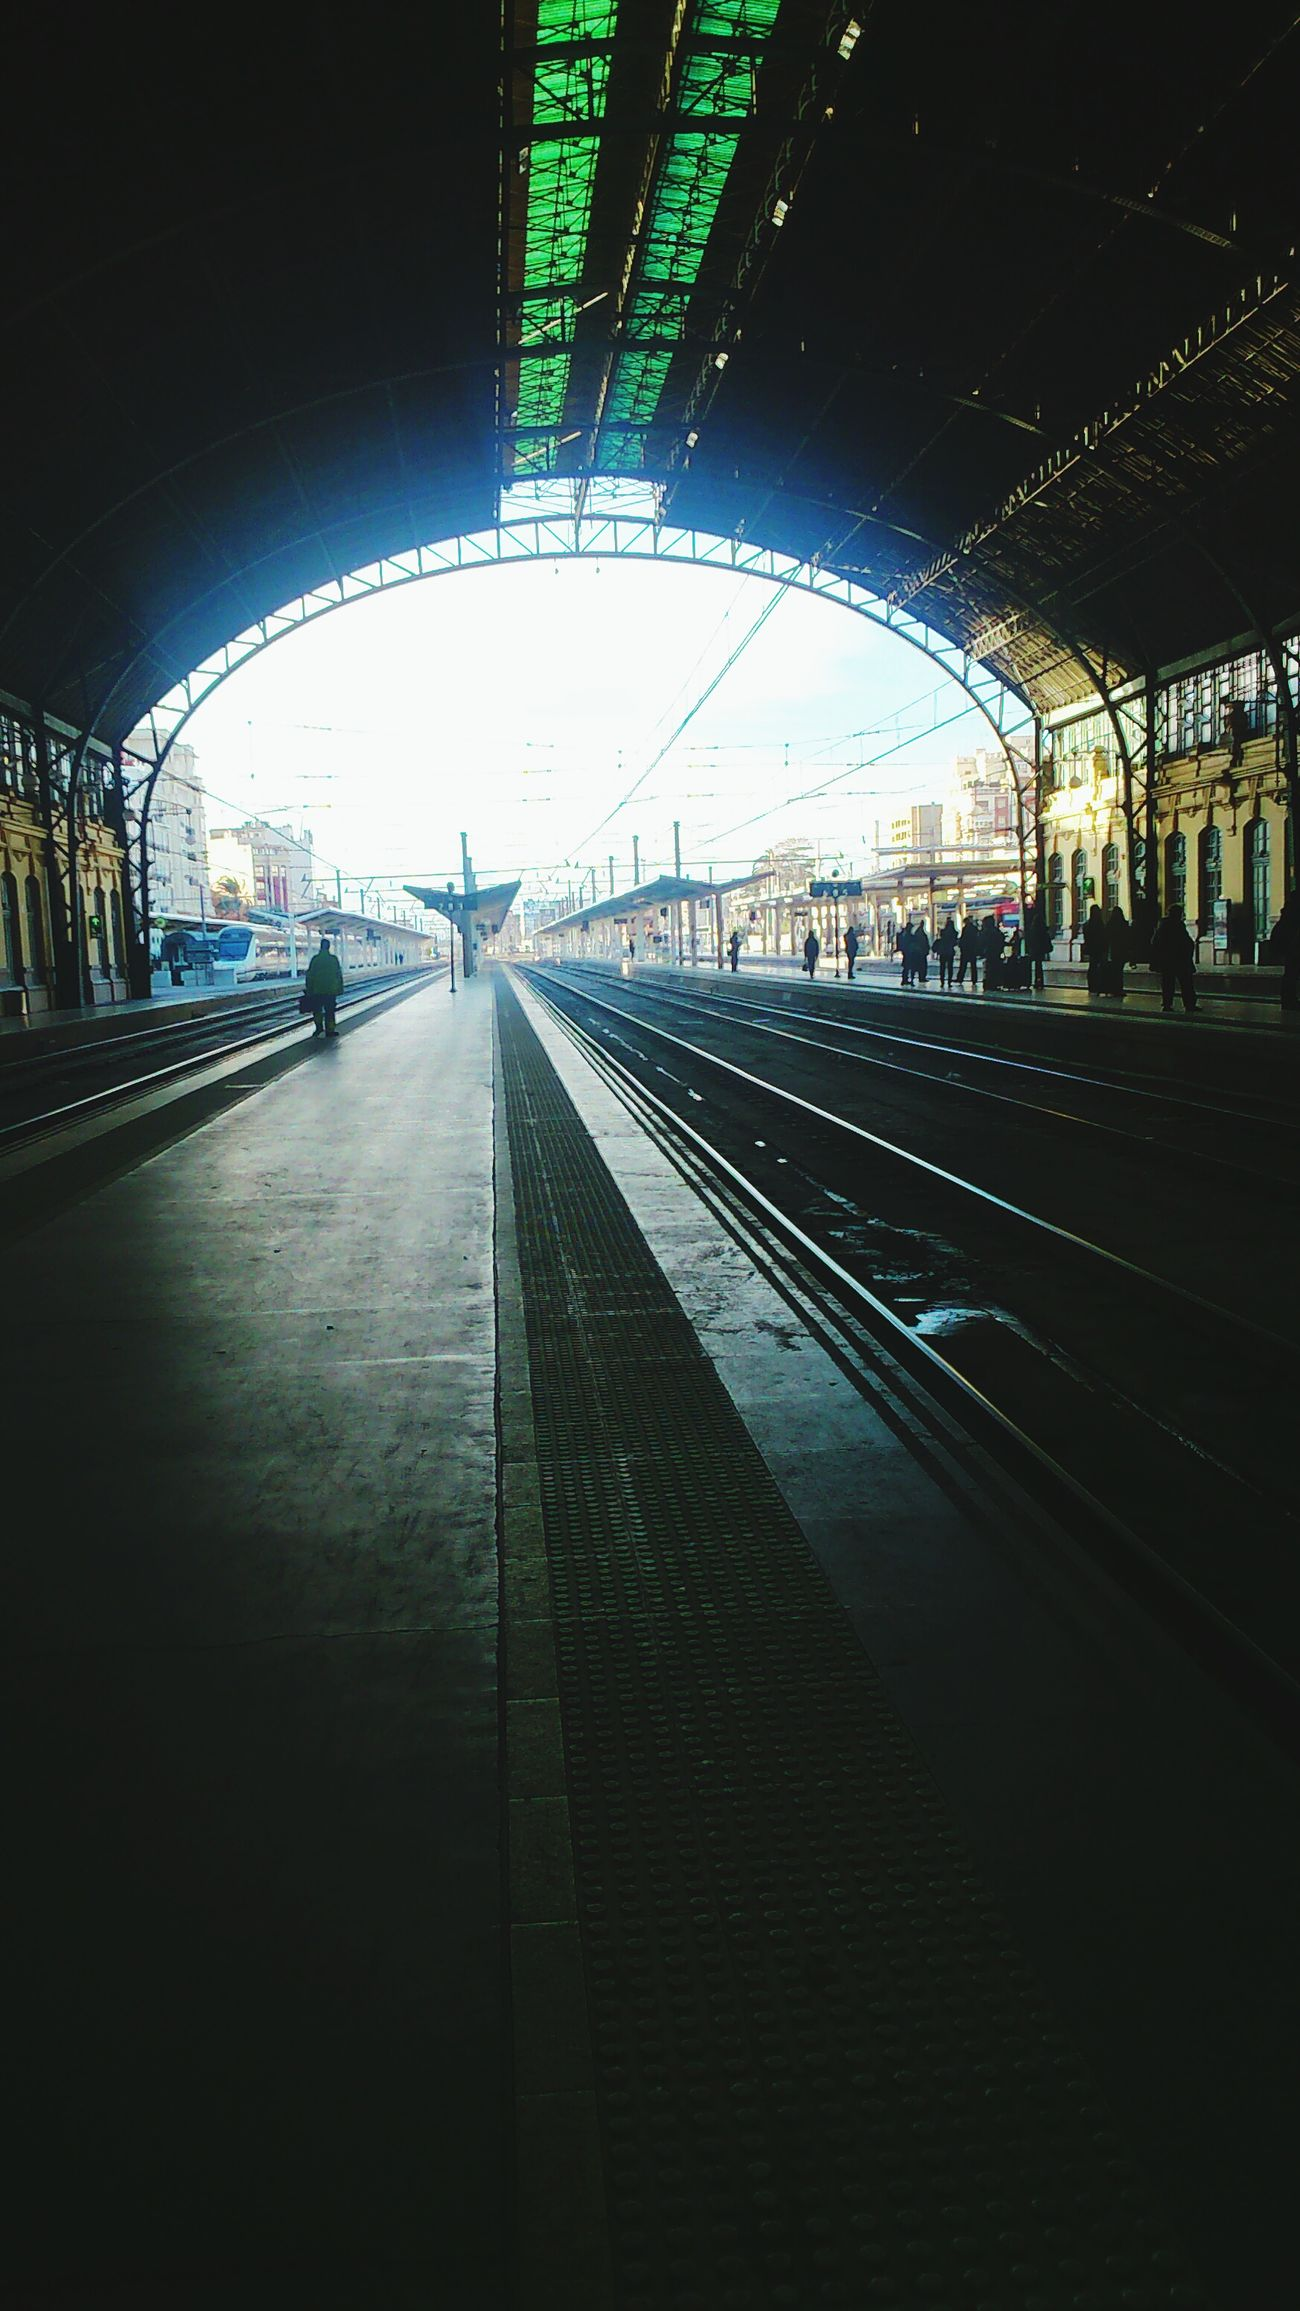 Waiting Train Morning